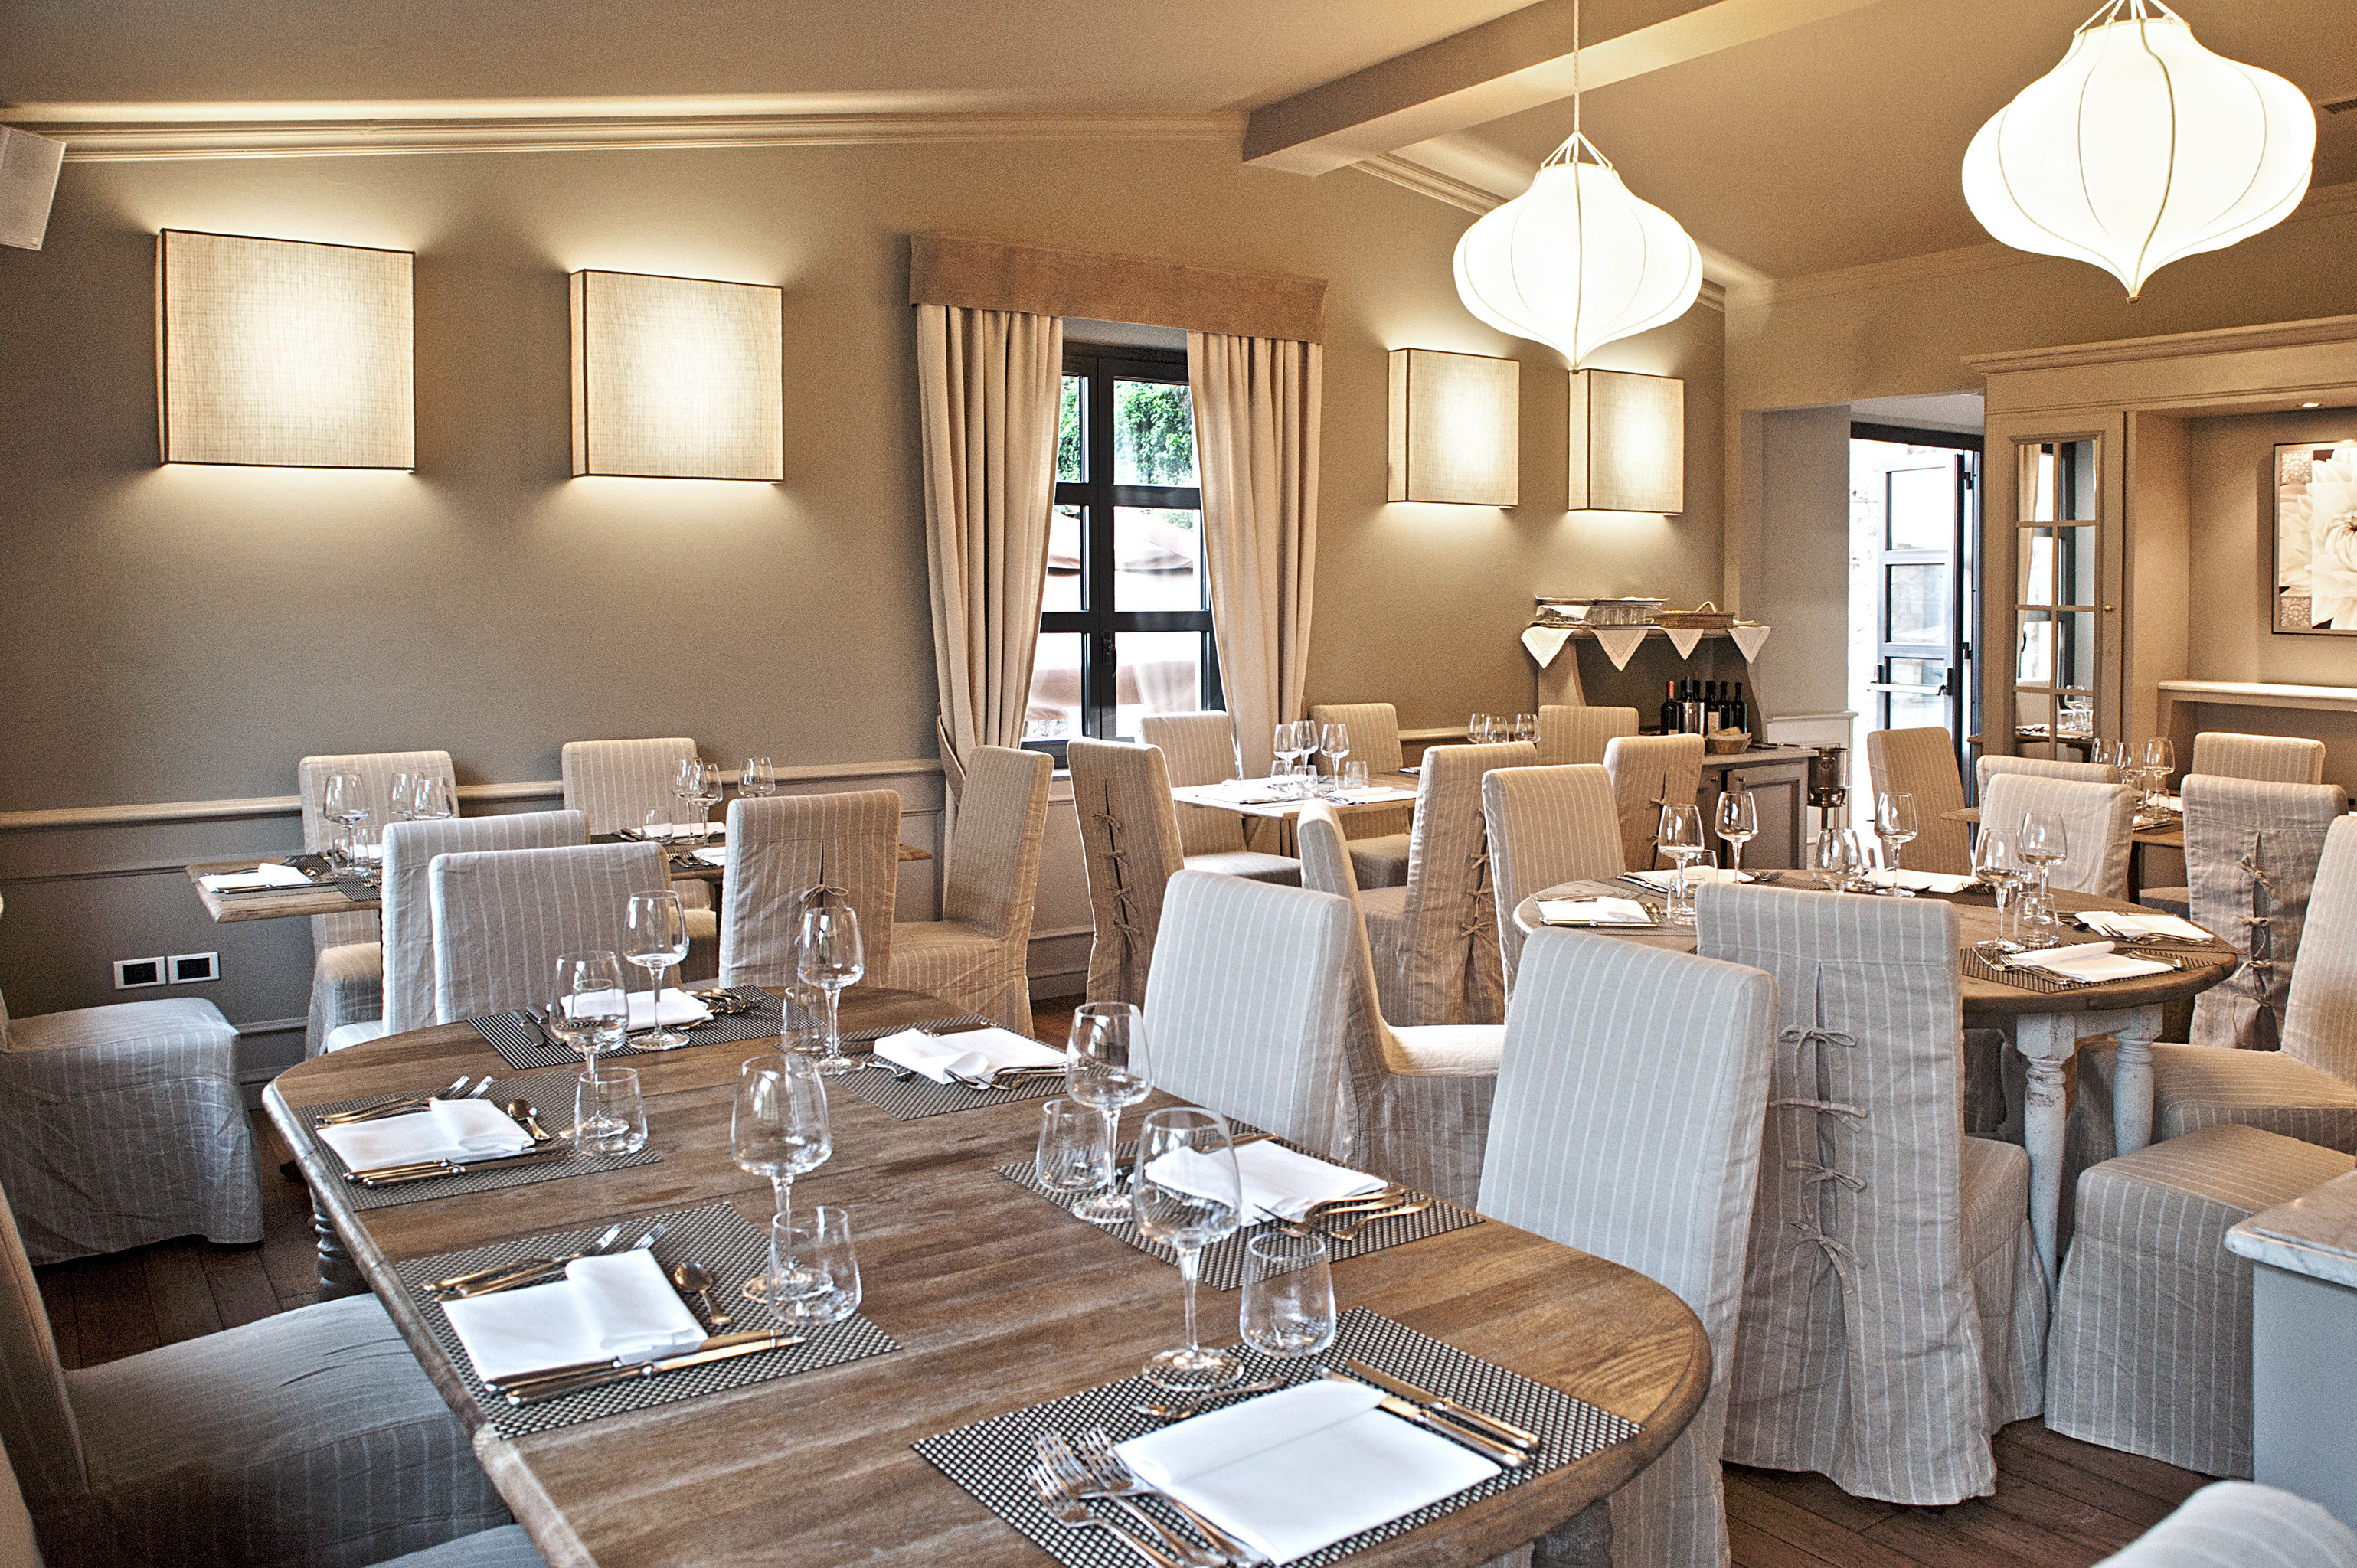 Boutique City Dining Drink Eat Elegant Honeymoon Romance Romantic Villa property restaurant living room home function hall Suite